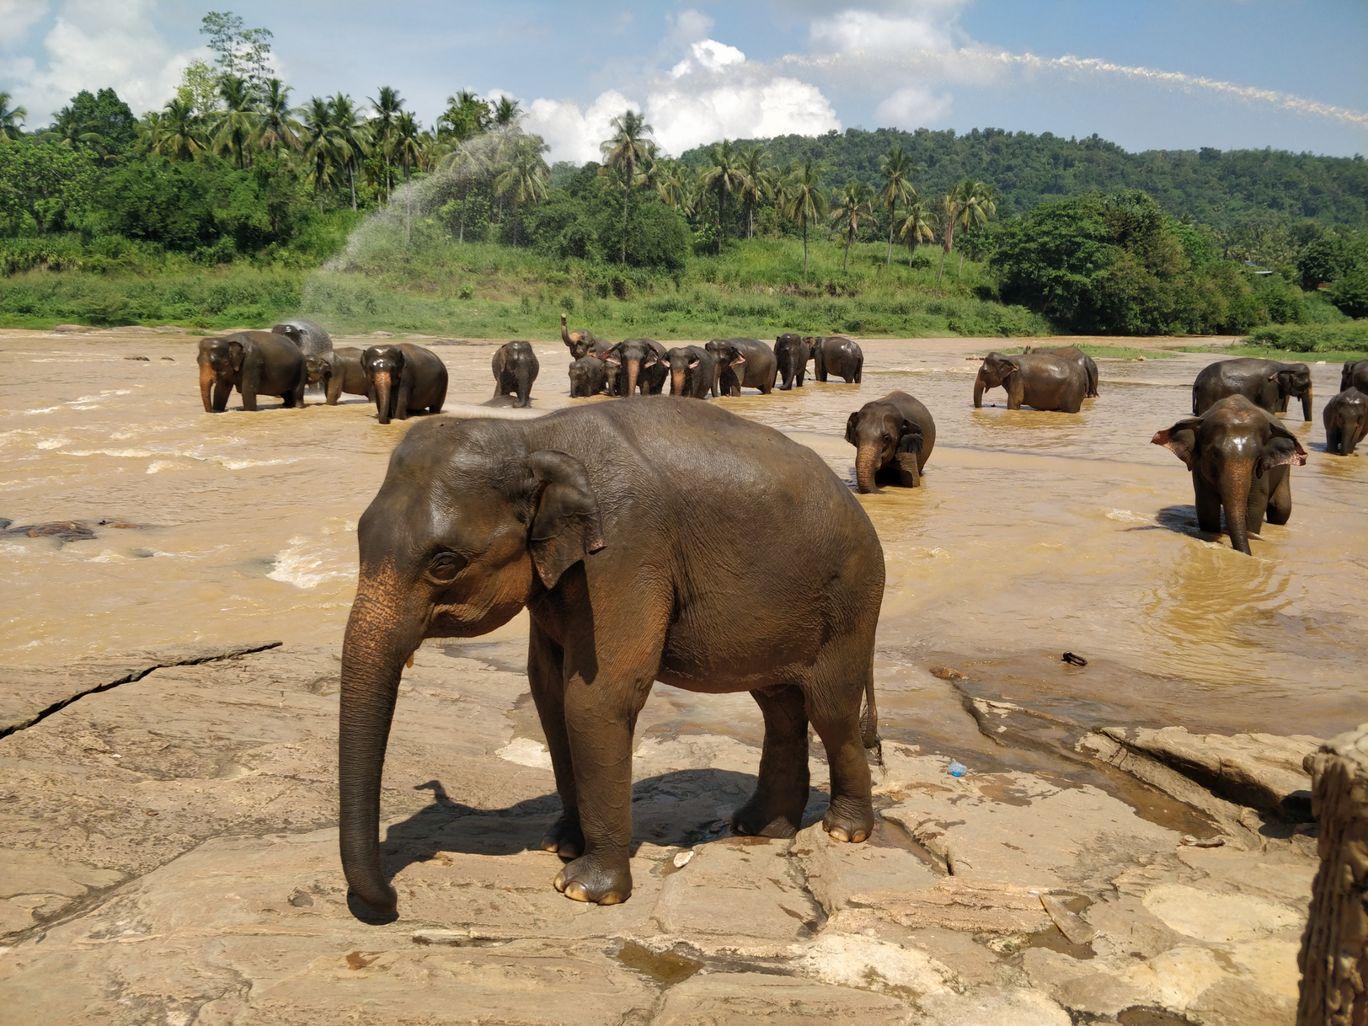 Photo of Sri Lanka By Malika Bhavnani